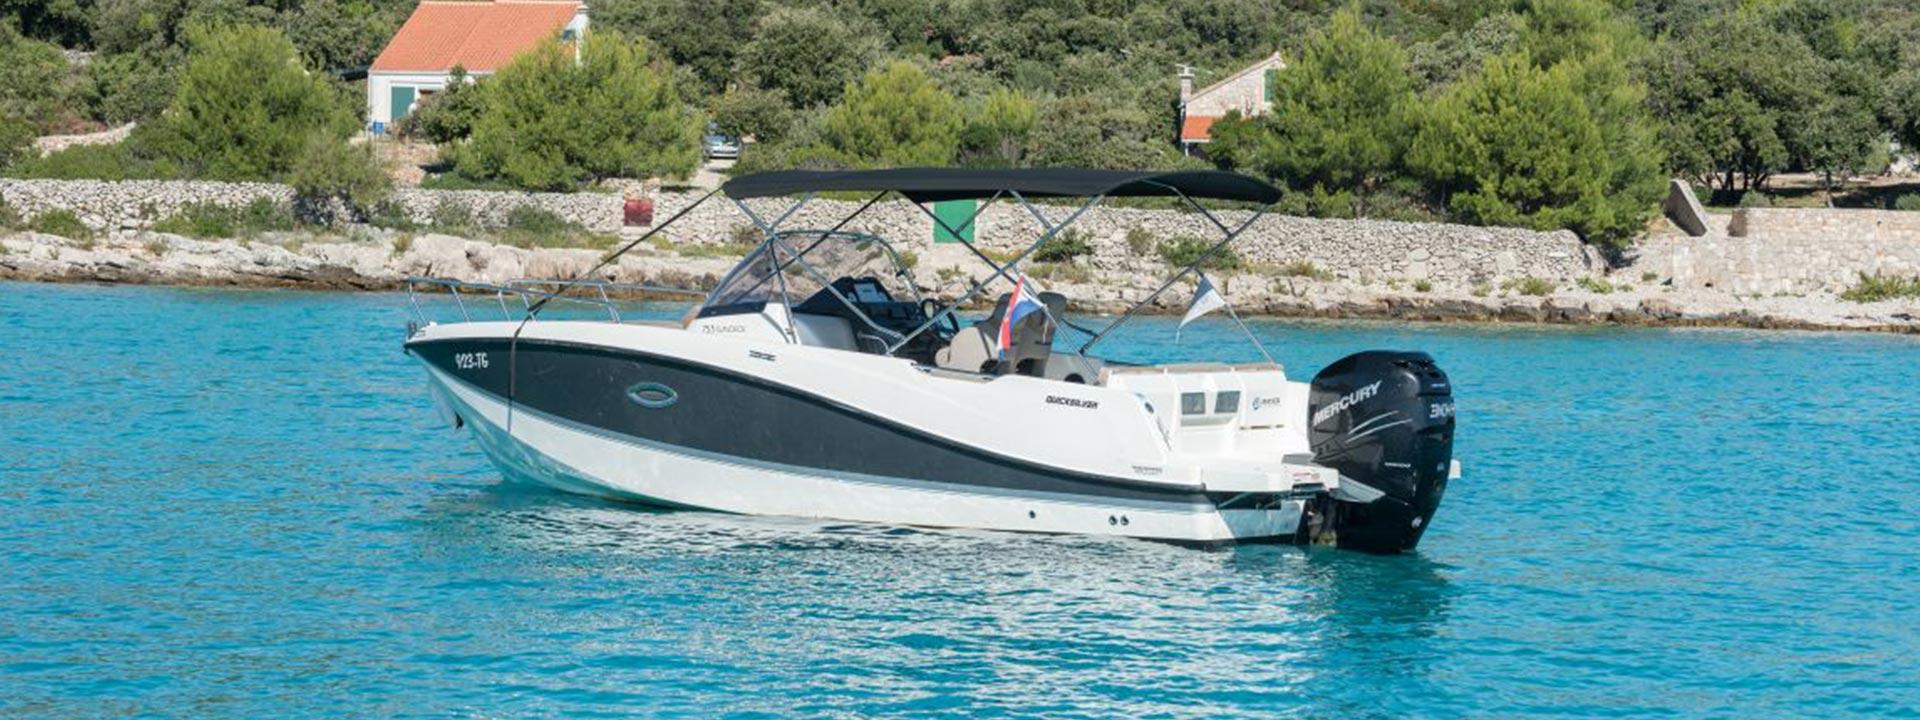 mayer-charter-boat-header-quicksilver-activ-755-sundeck-02